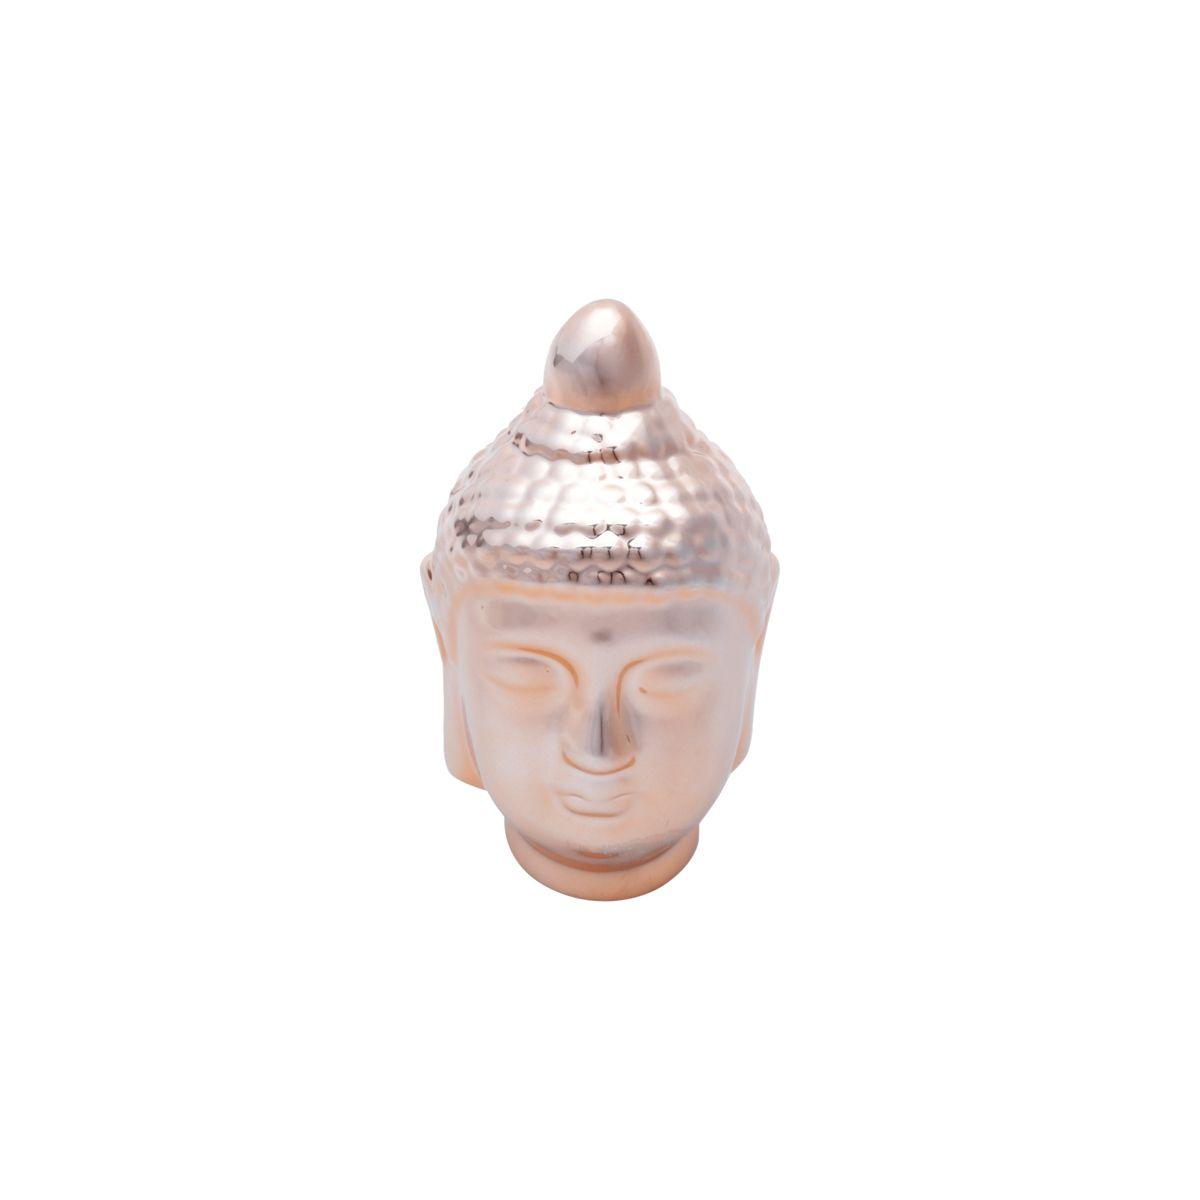 Buda Hindu Namastê Tibetano Sidarta em Cerâmica Cobre